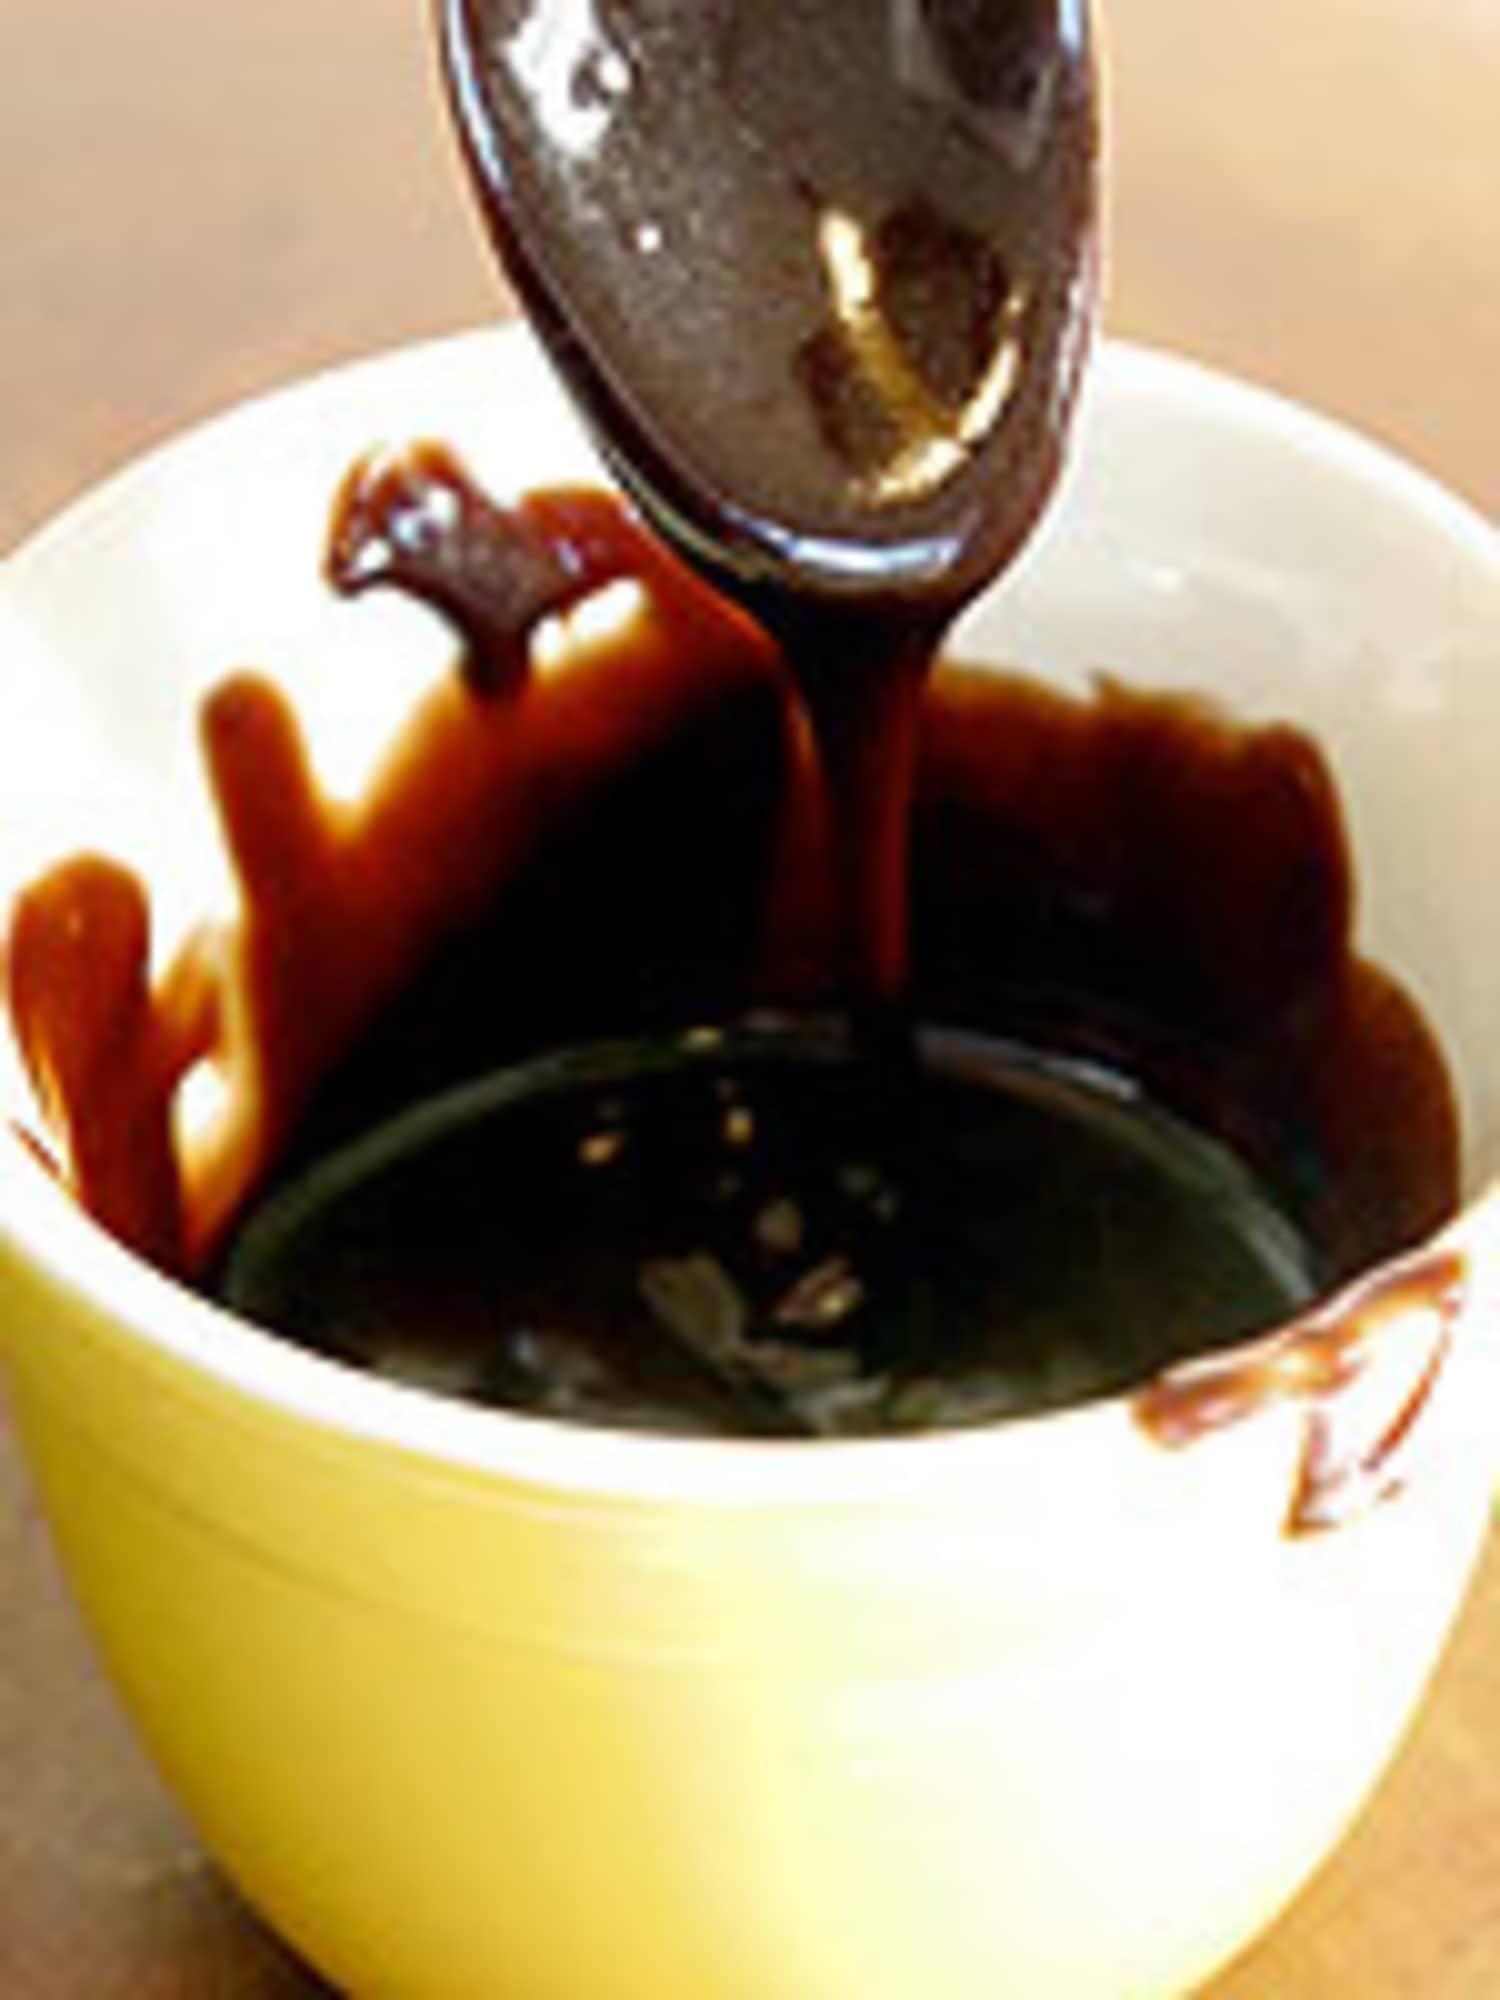 Recipe: D.I.Y. Hot Fudge Sauce